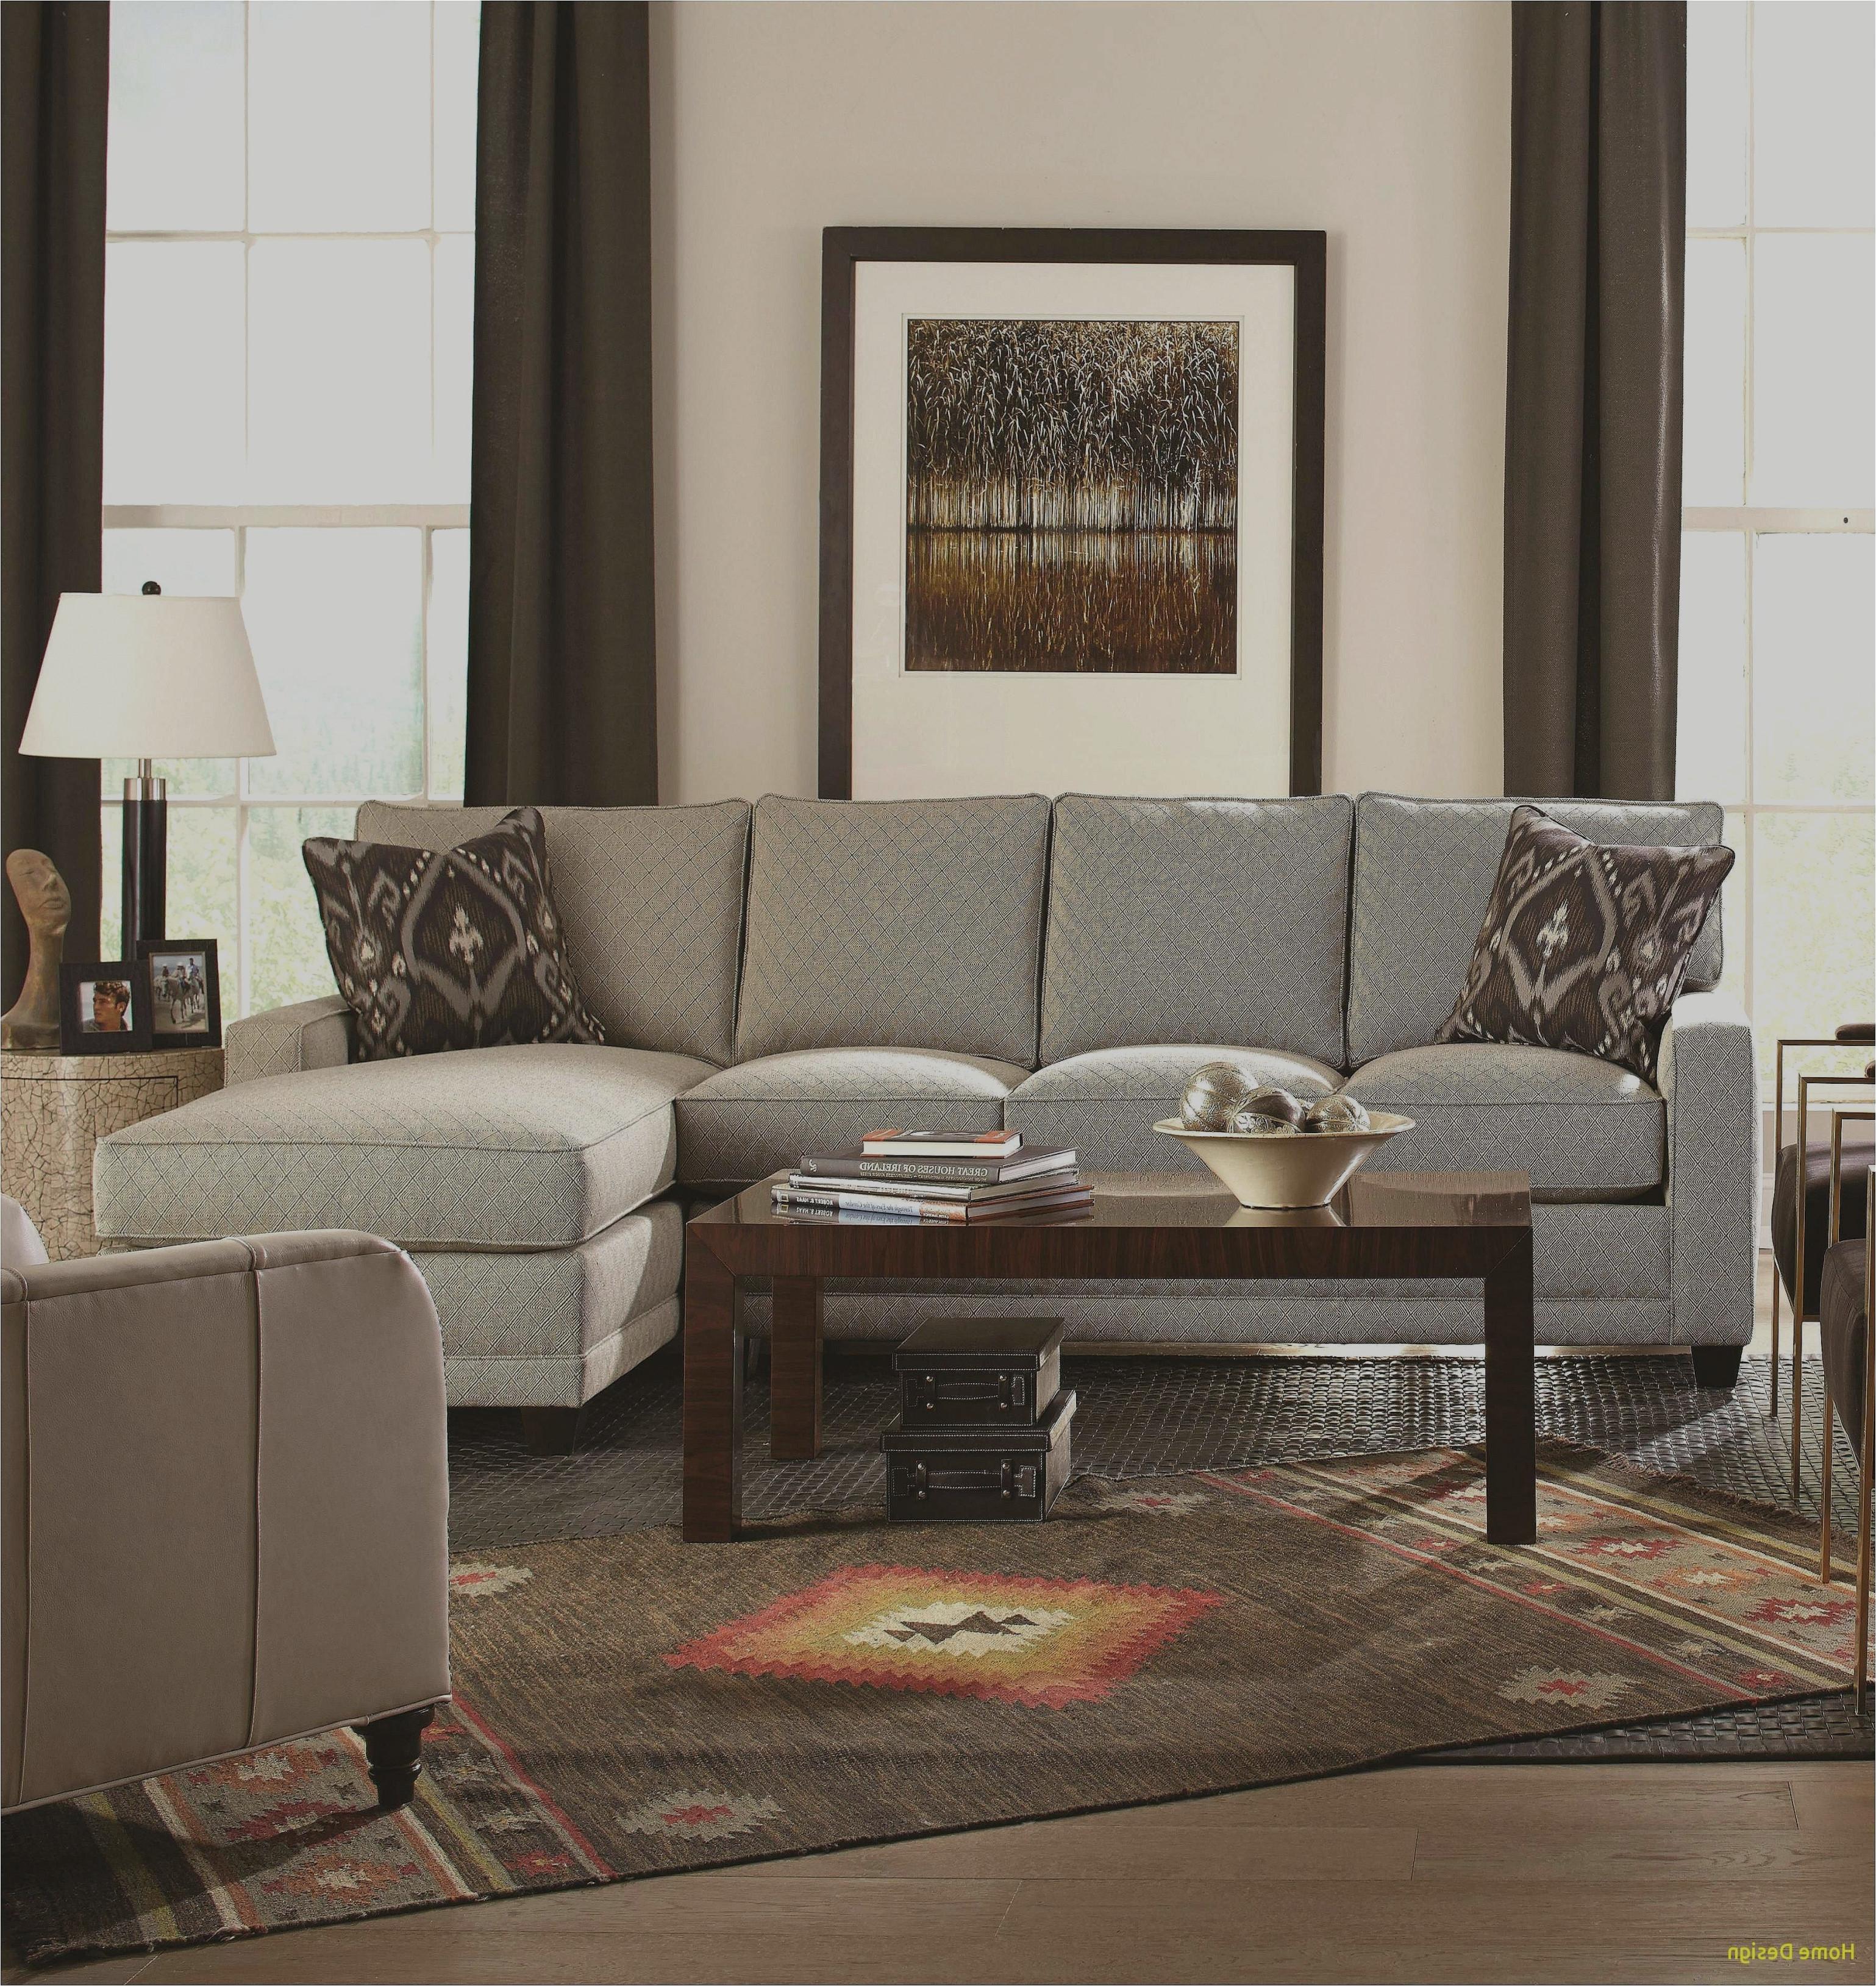 Luxury Bedroom Furniture Fresh 13 Luxury Bedroom Furniture Near Me Fresh Home Design Ideas